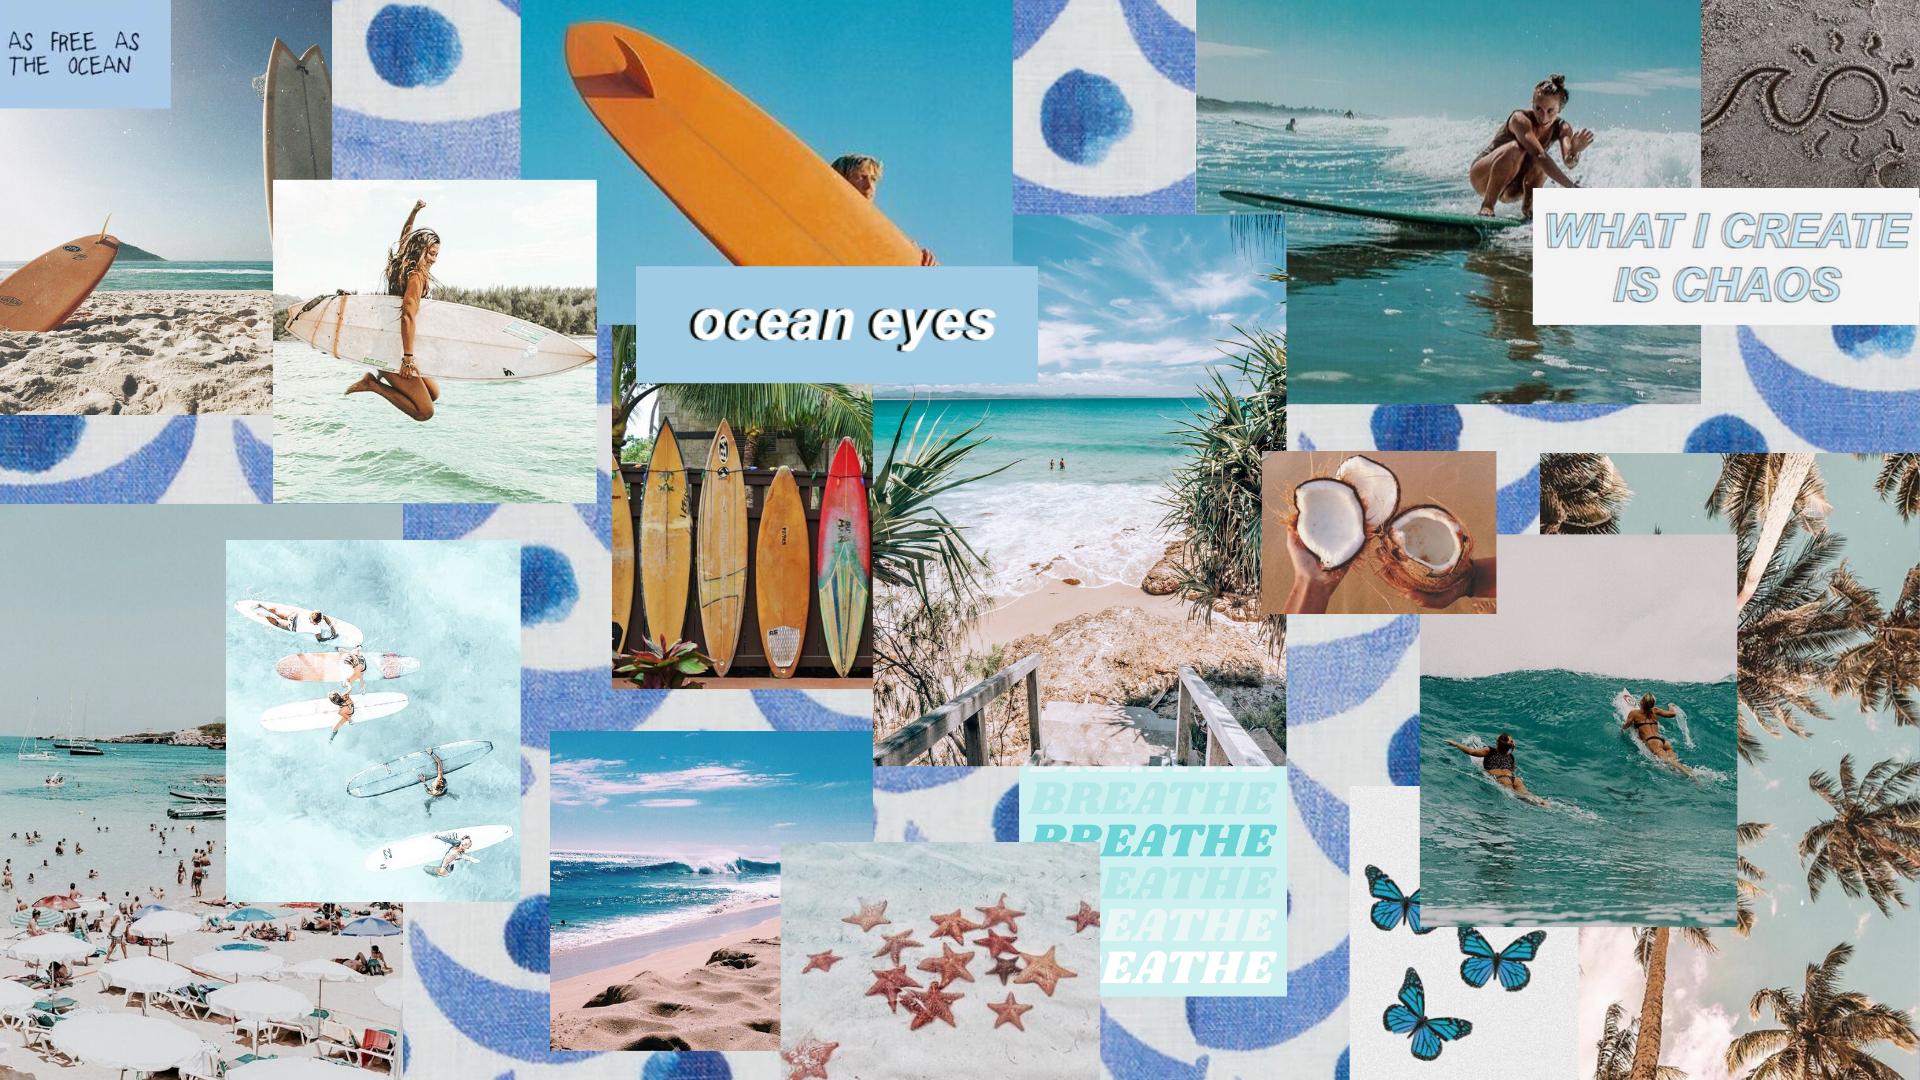 theme collage aesthetic desktop wallpaper laptop